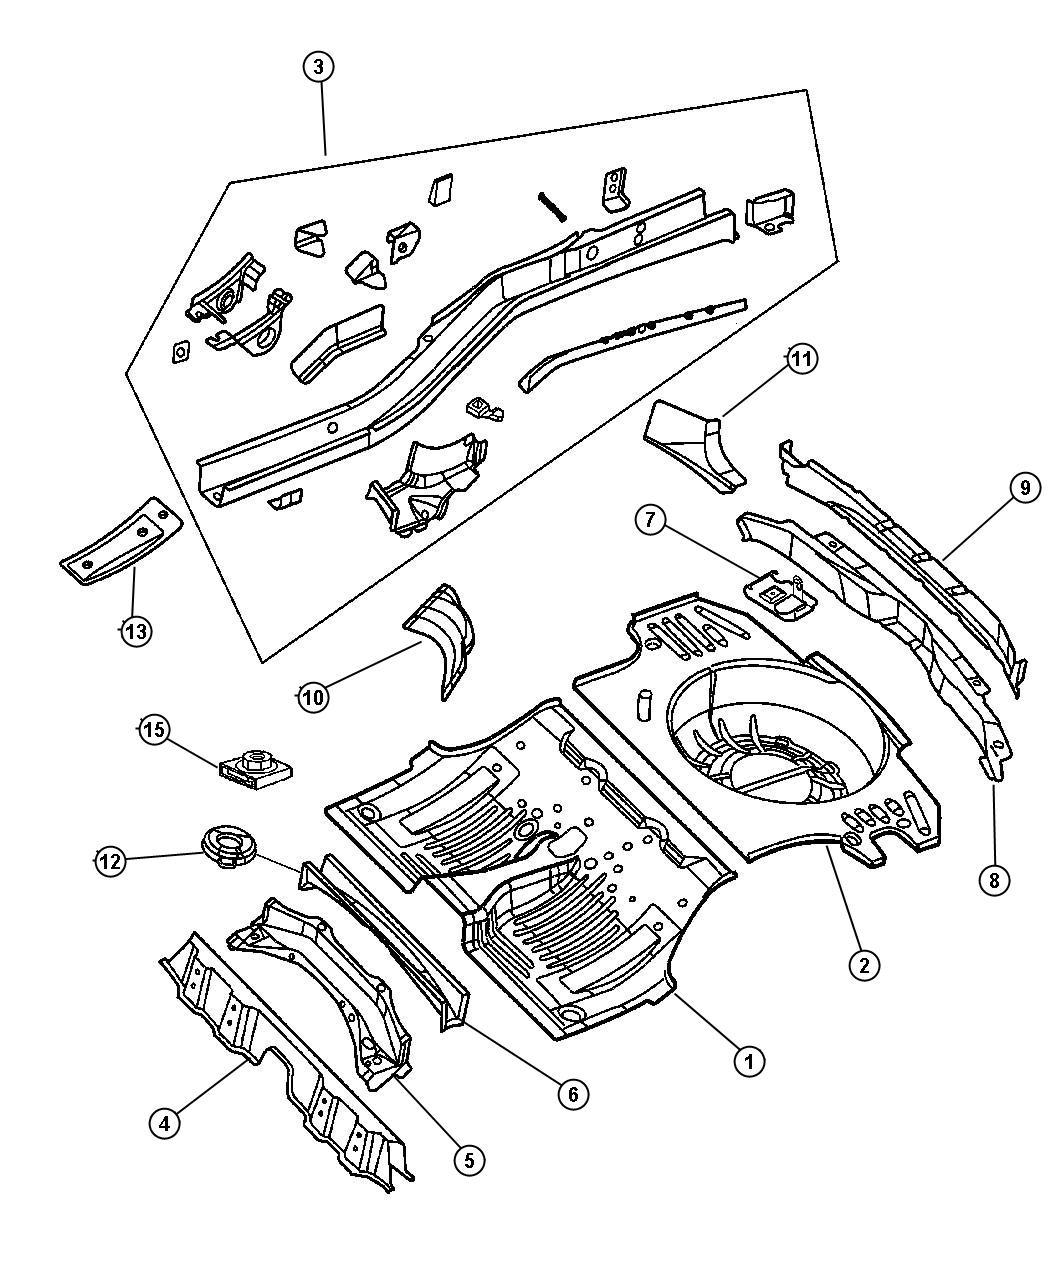 2008 Jeep Patriot Fuel Tank | Wiring Diagram Database